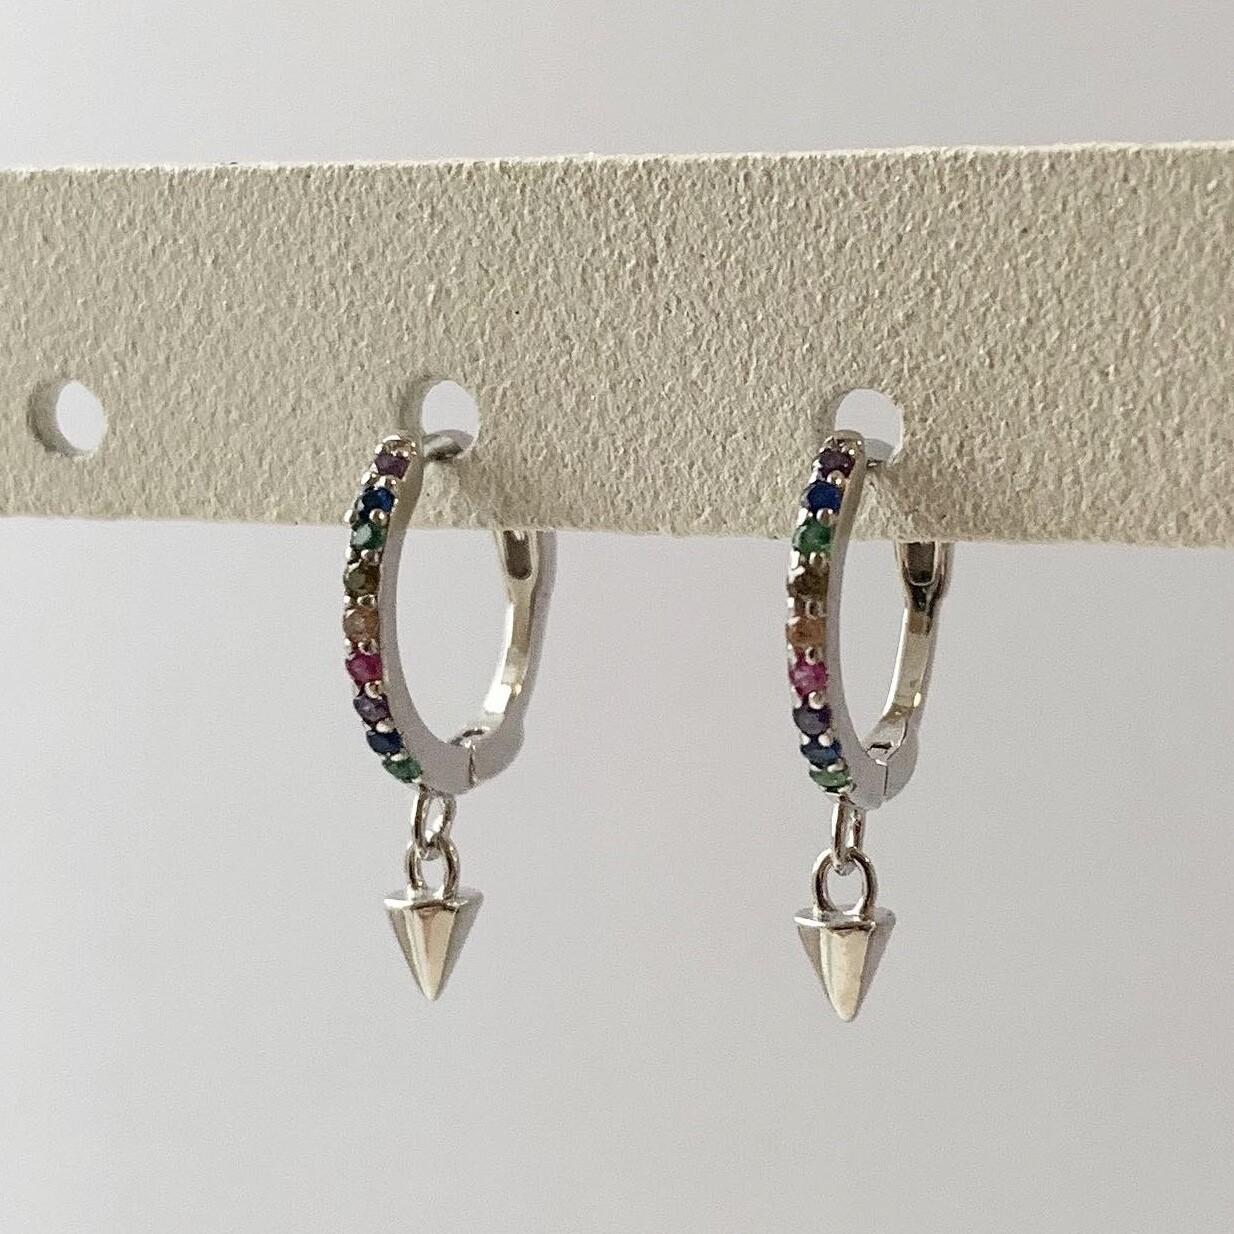 Rainbow oorringetjes met spike hangertje 925 sterling zilver